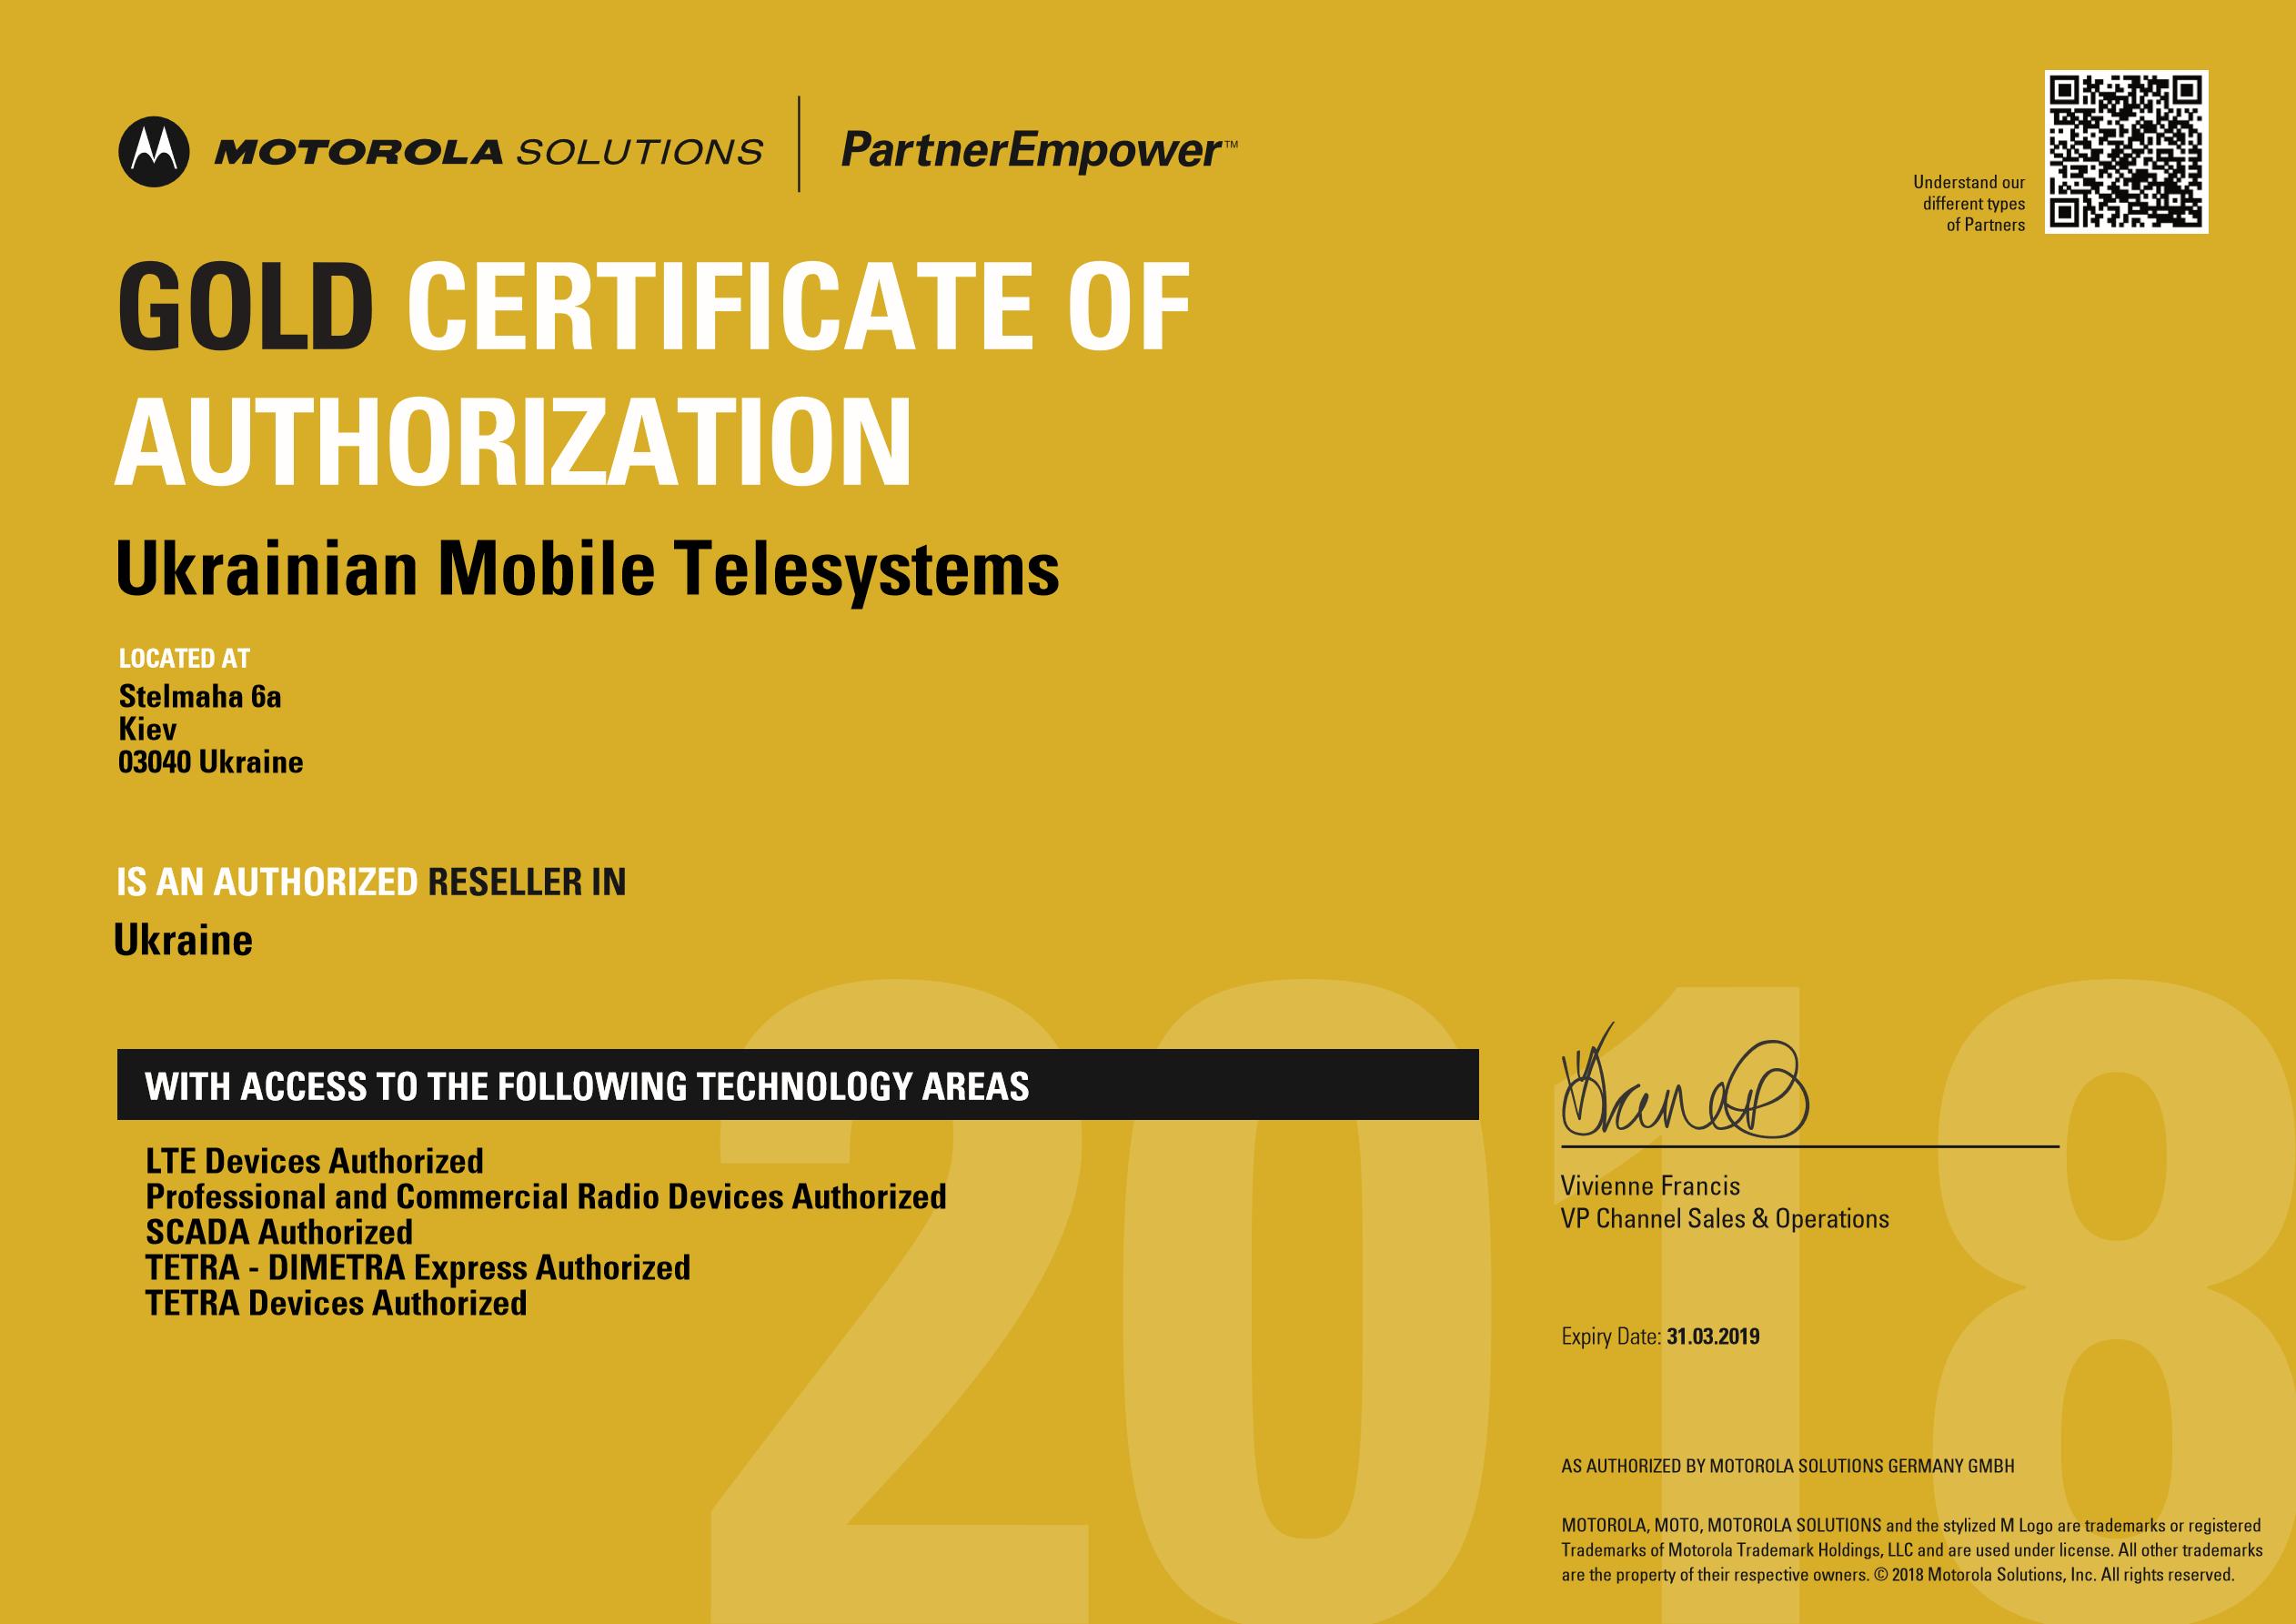 Сертификат дистрибьютора Motorola 2018